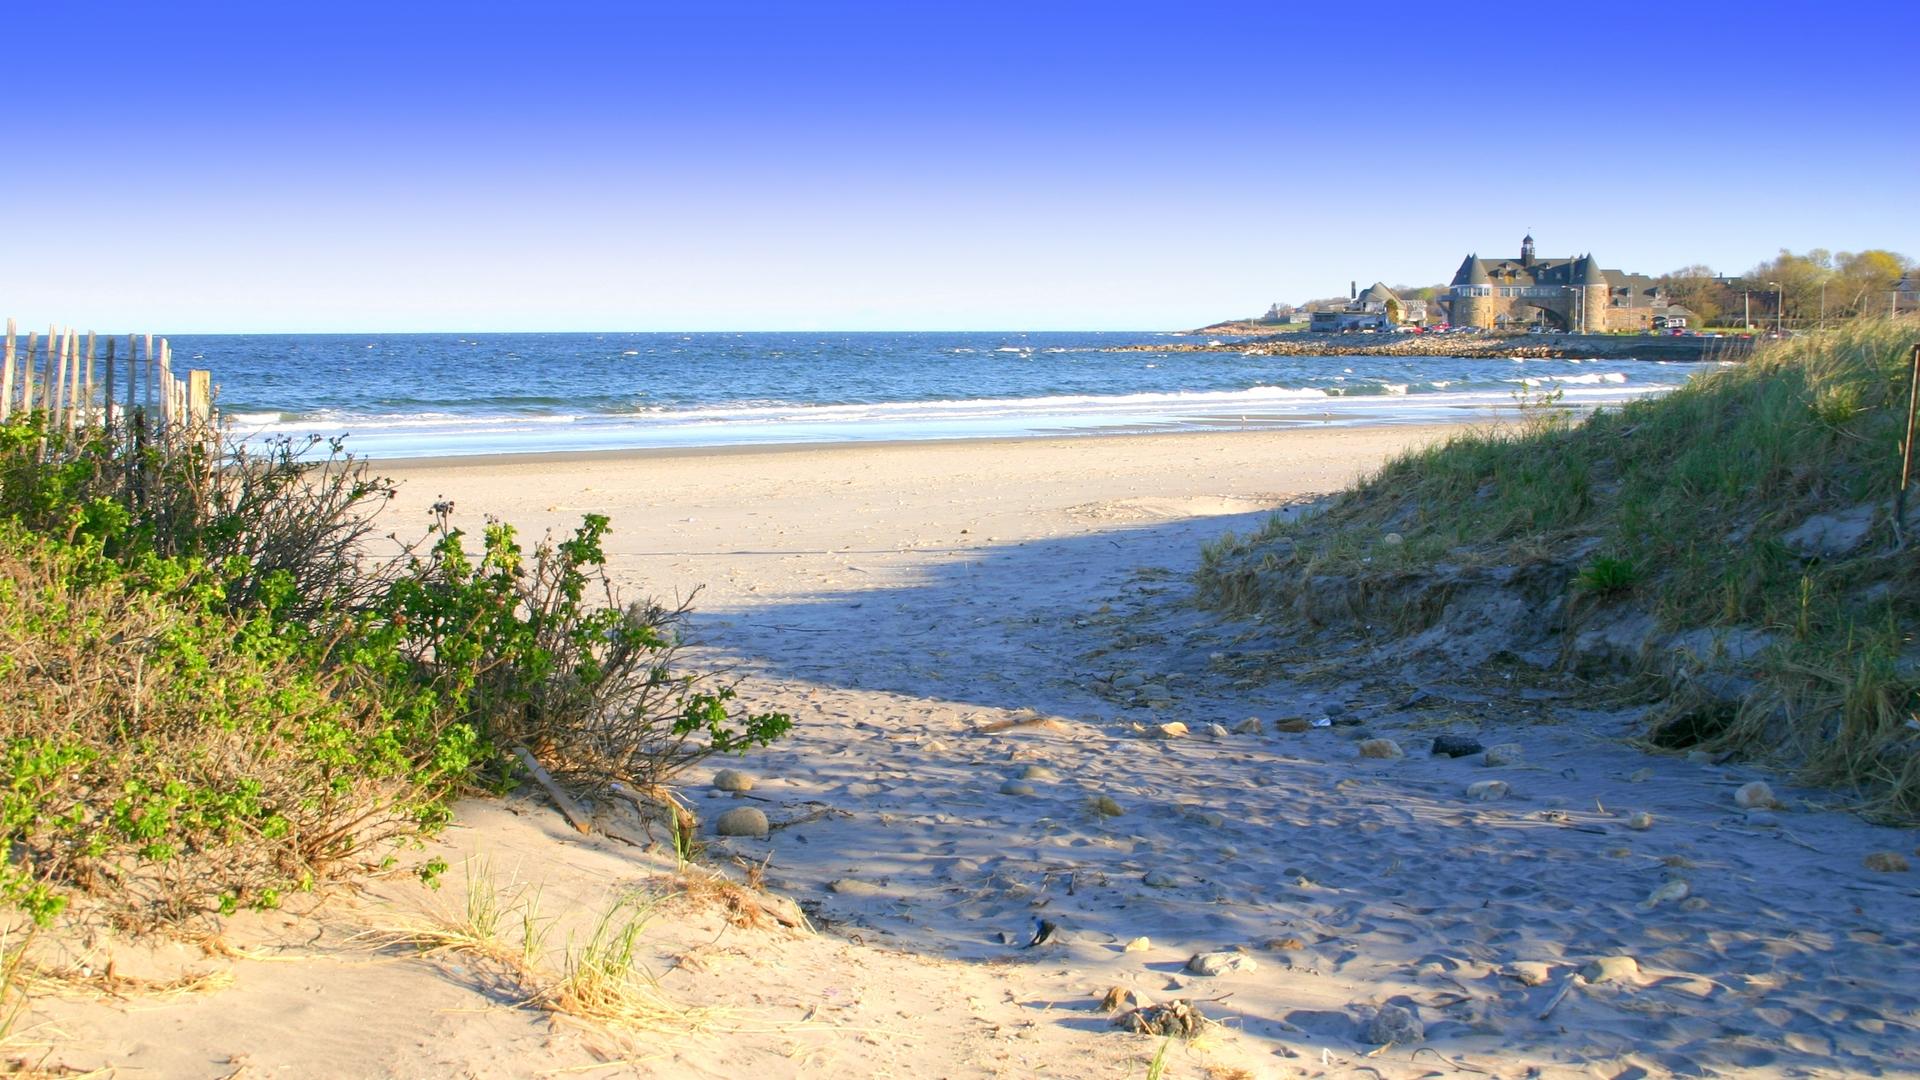 playa de naraggansett en rhode island wallpaper 1920x1080